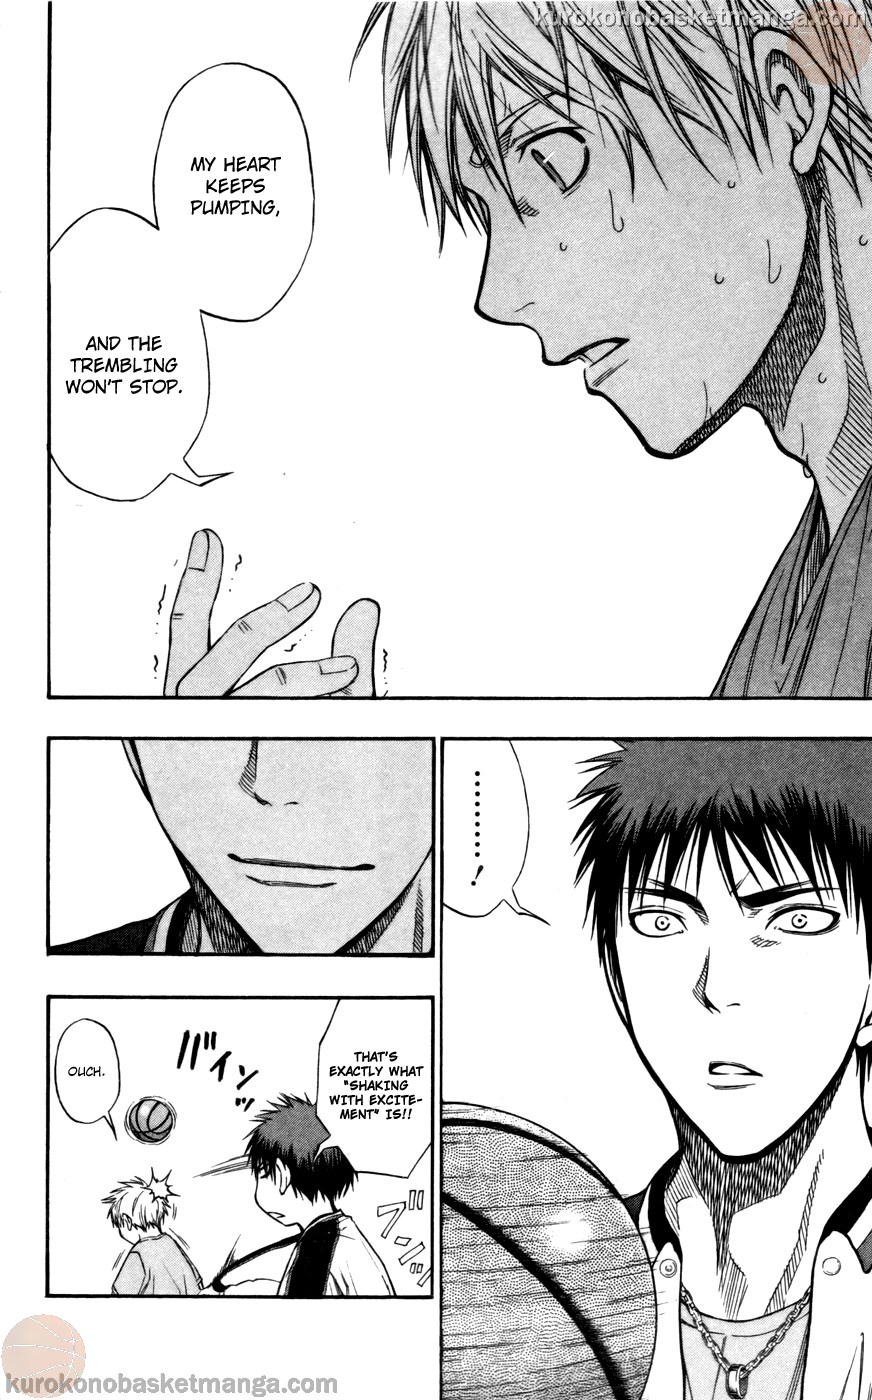 Kuroko no Basket Manga Chapter 108 - Image 14